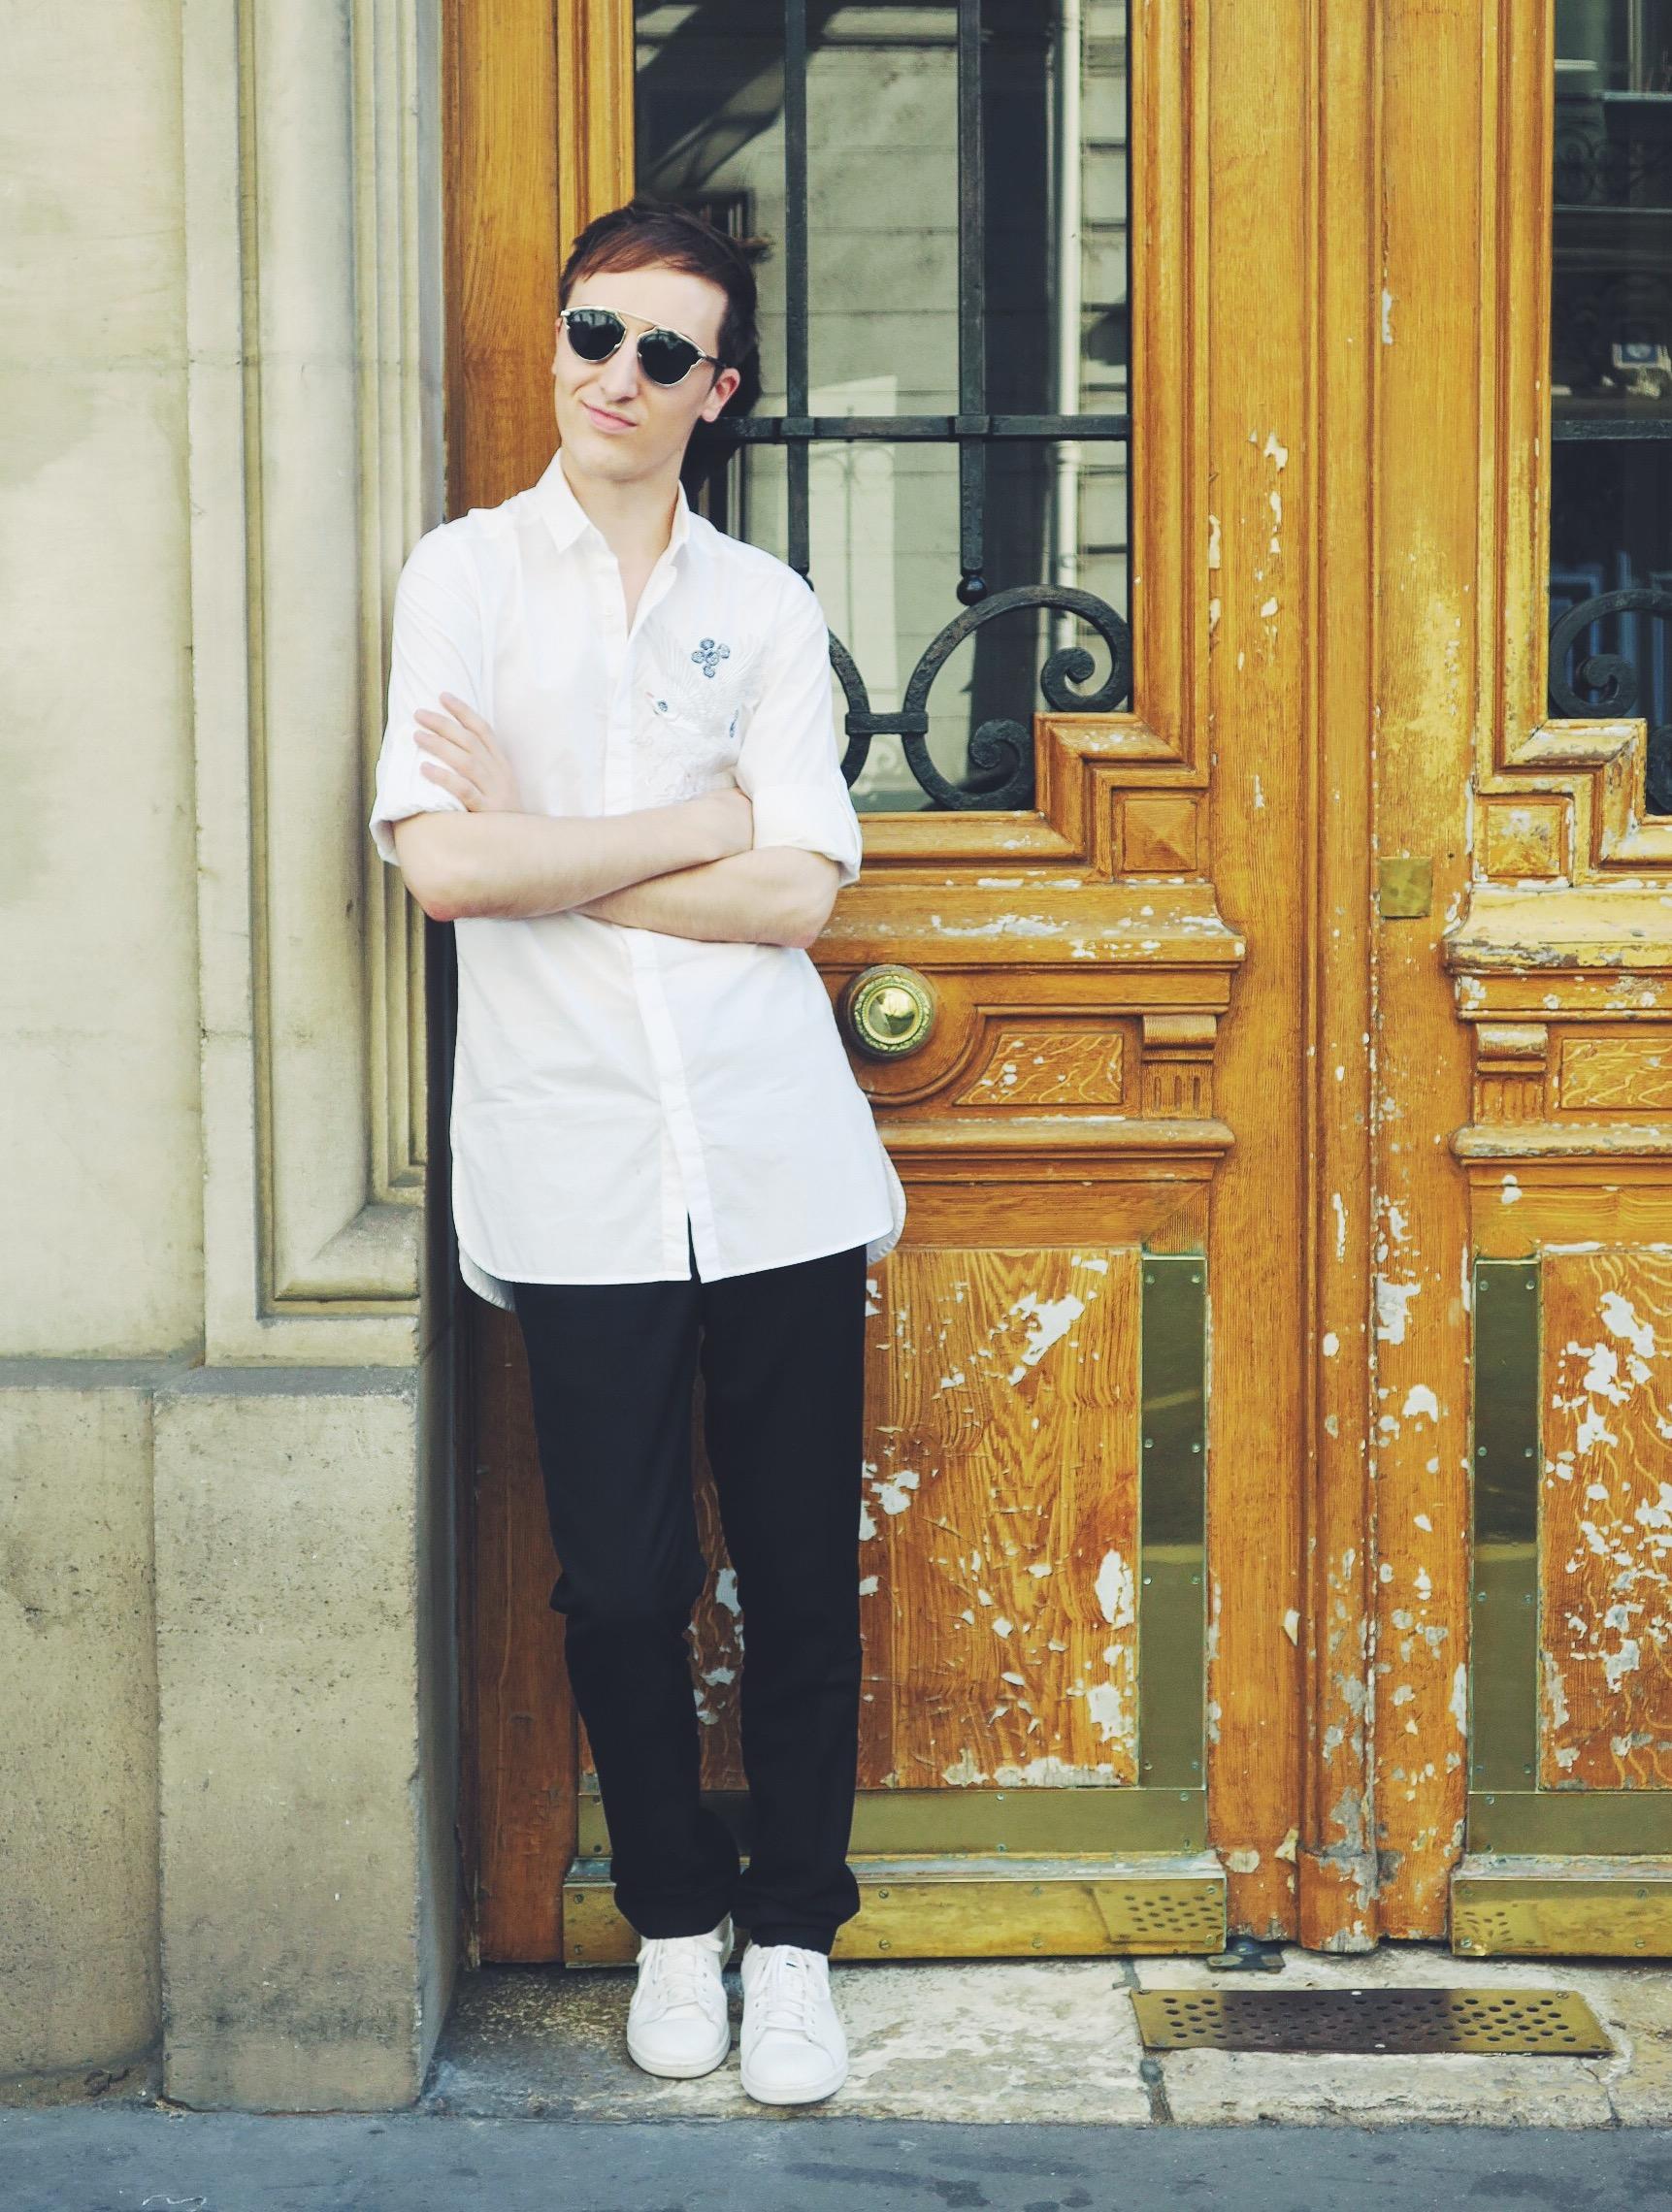 Zara shirt - Zara trousers - Adidas Stan Smith sneakers - Wavvse sunglasses